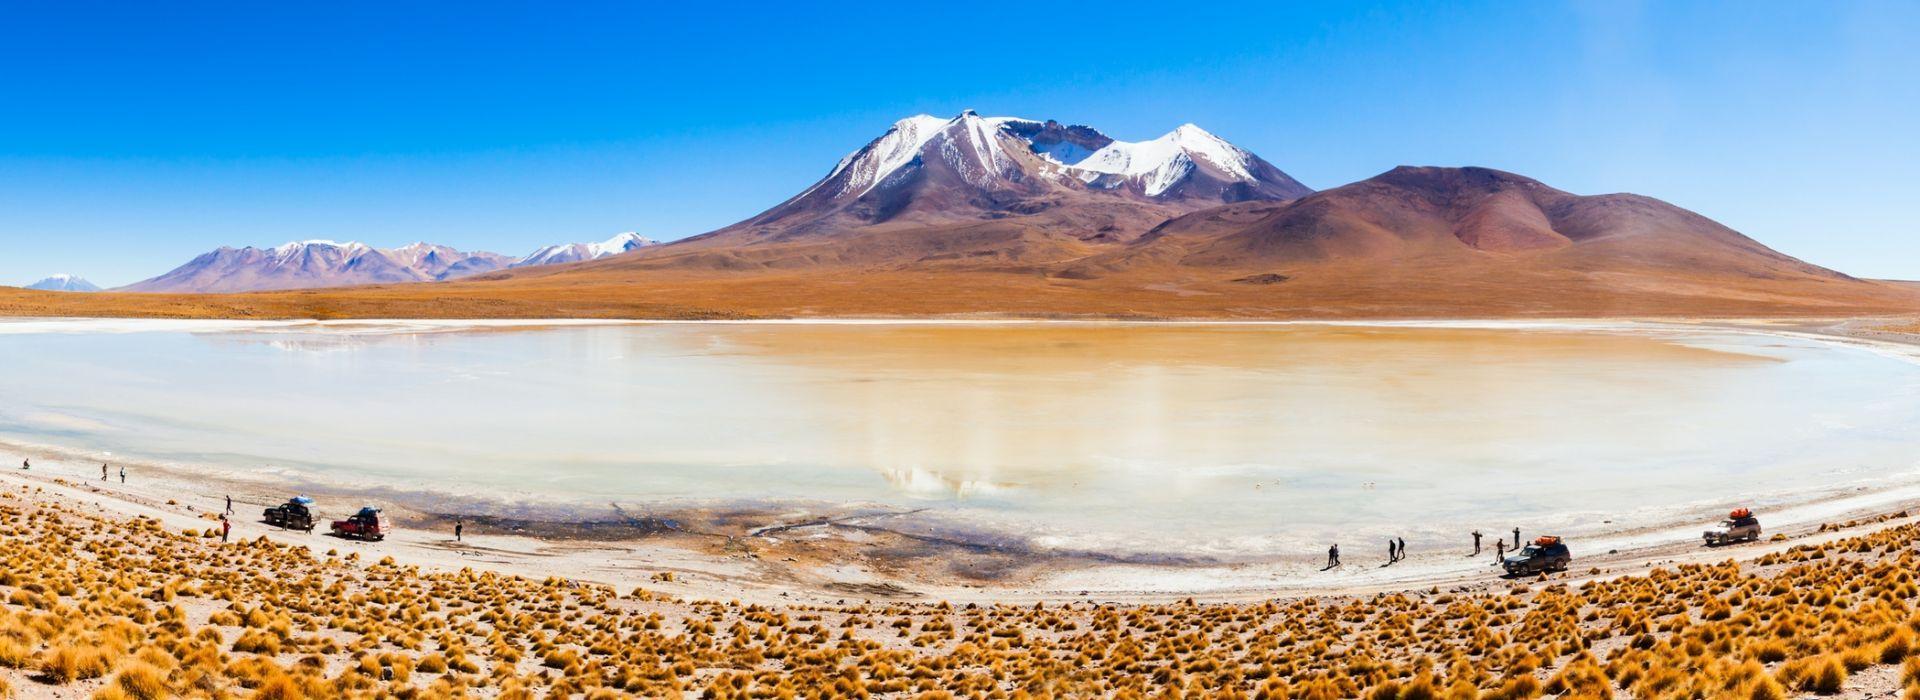 Adventure Tours in La Paz